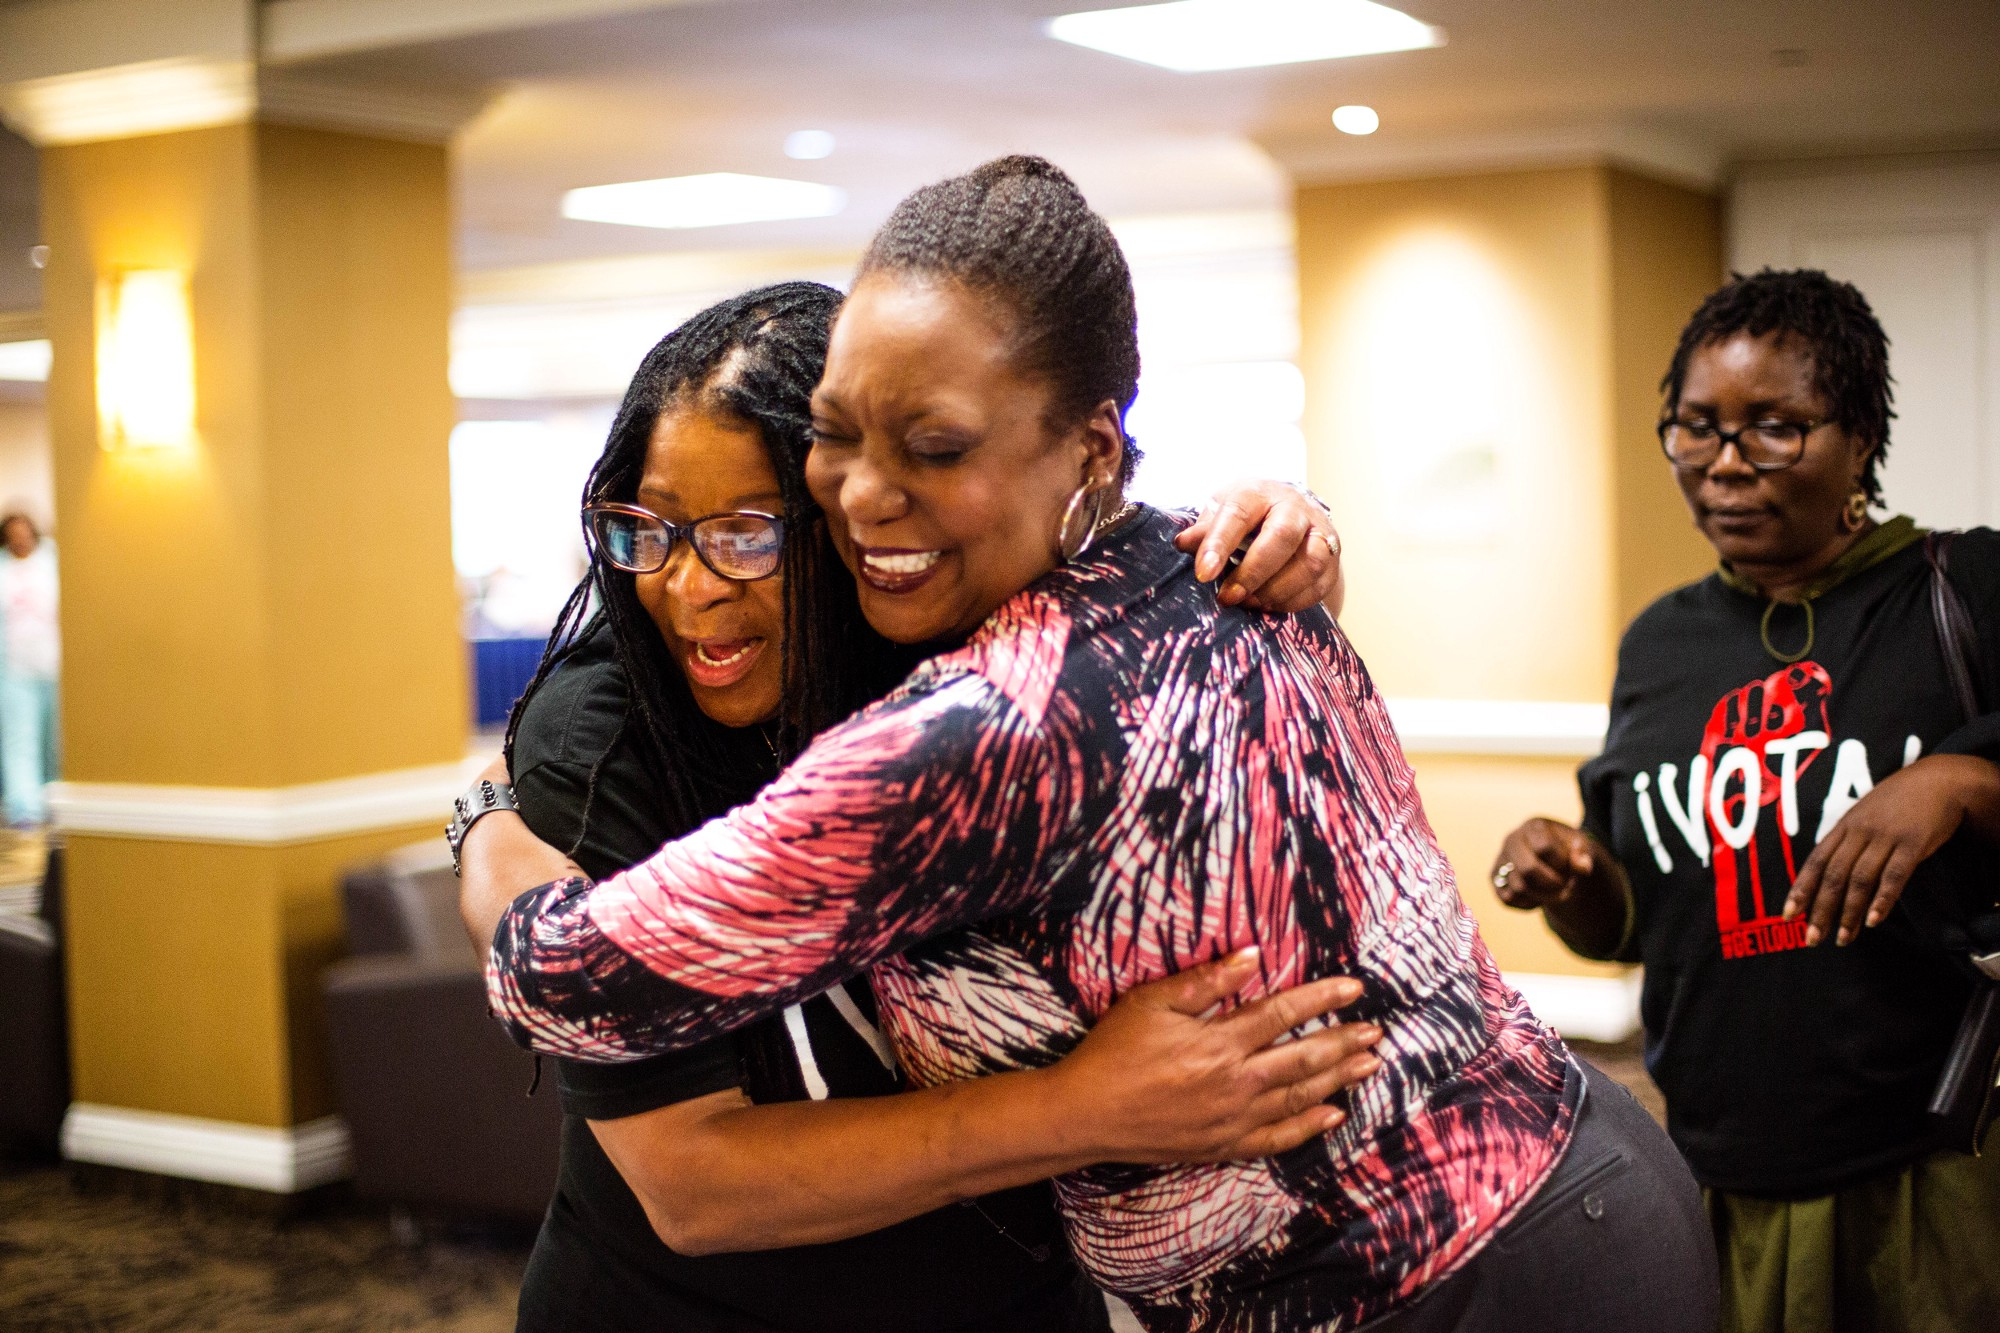 Susan Burton, Becoming Ms. Burton, A New Way of Life, African American Women, Criminal Justice Reform, KOLUMN Magazine, KOLUMN